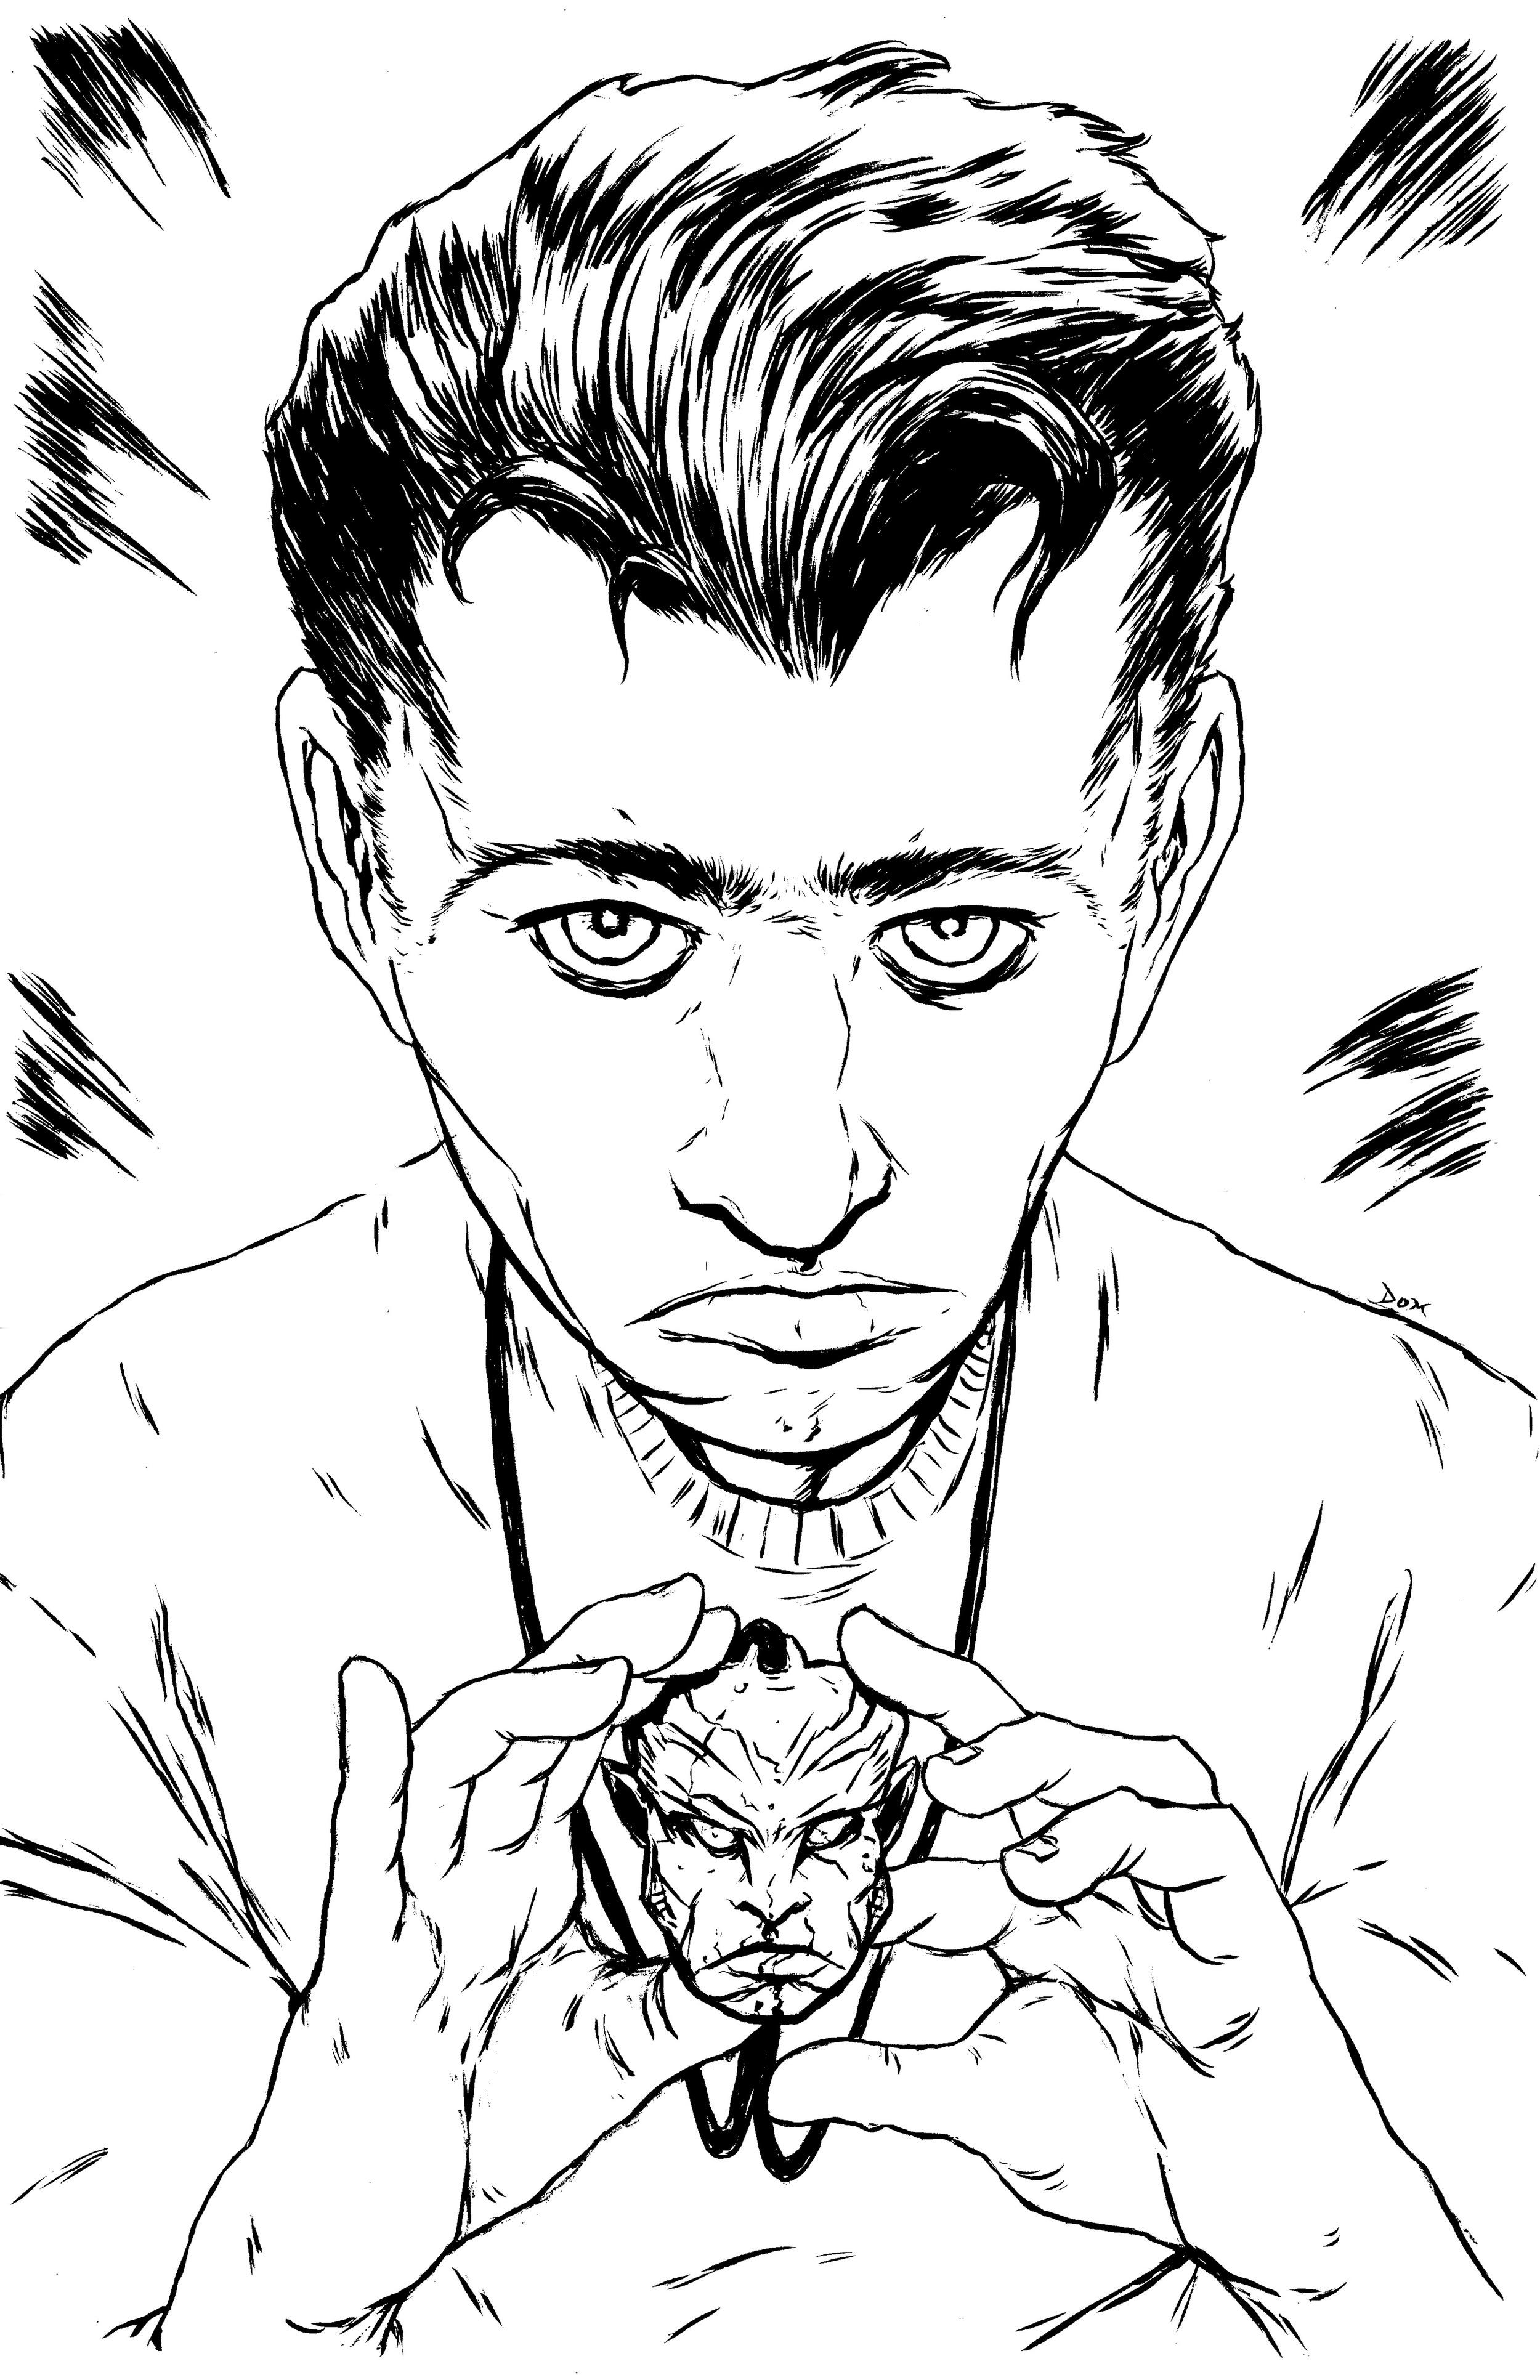 Vyvyan's Father